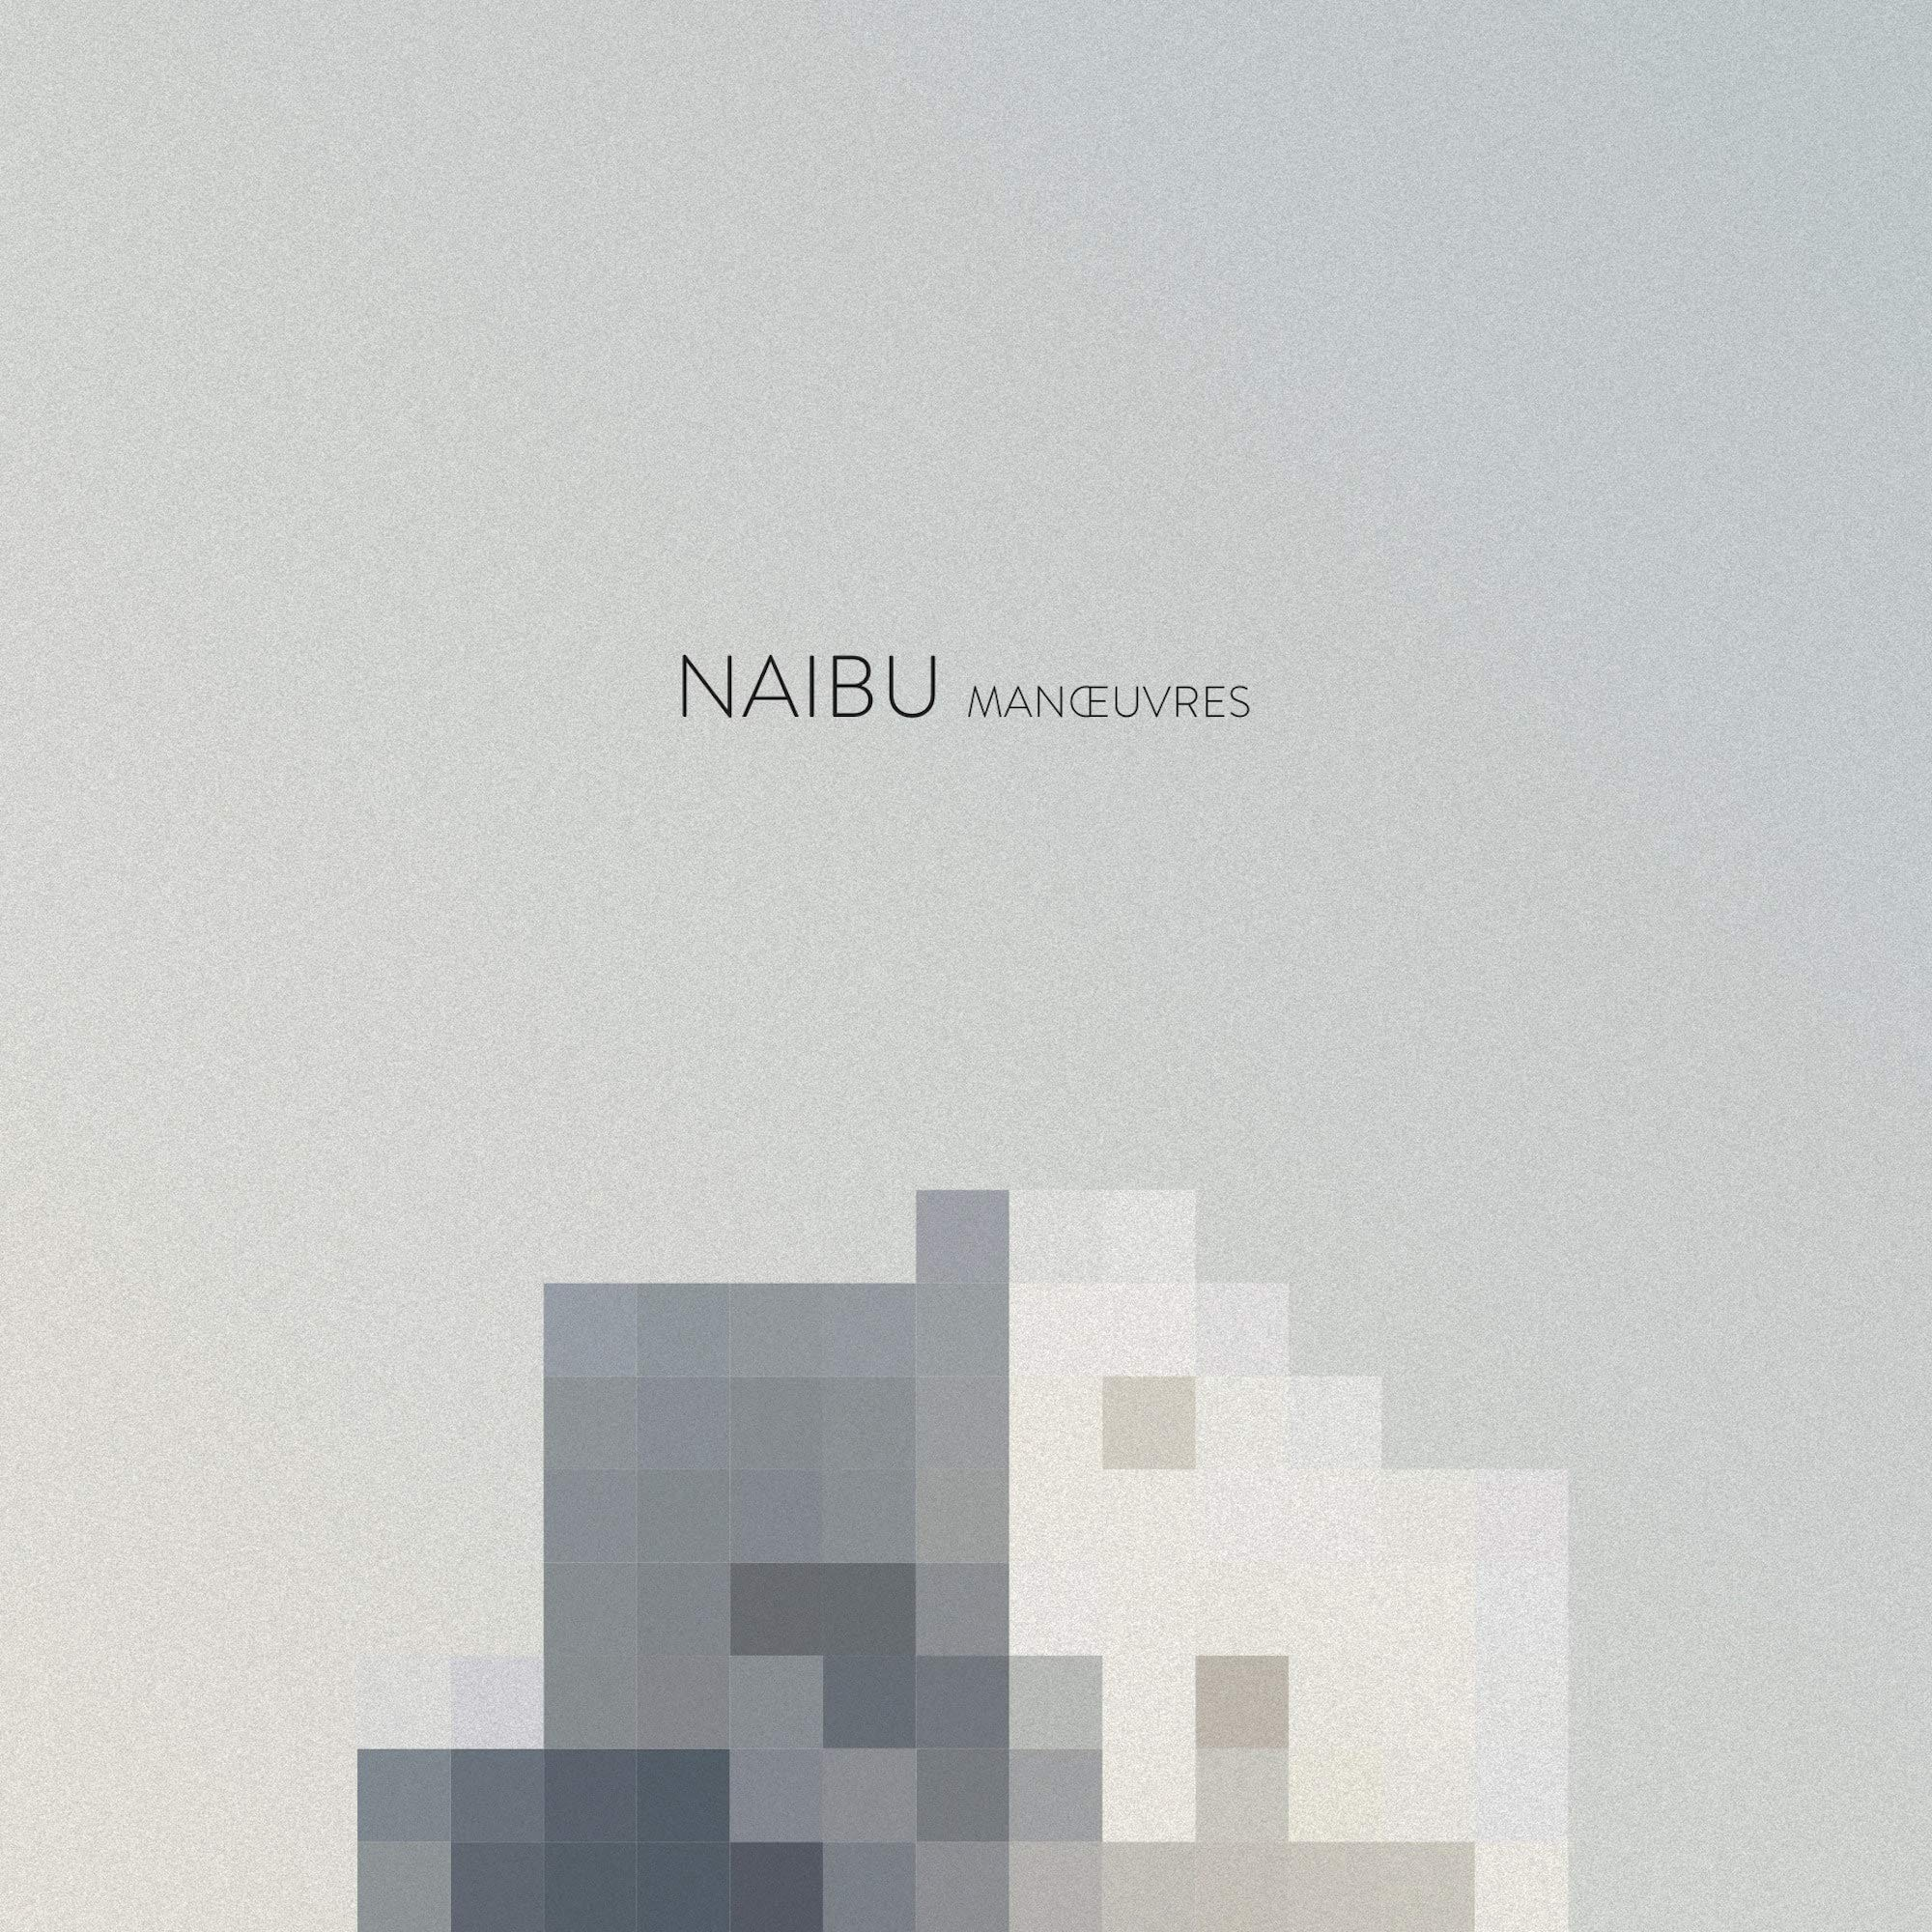 Naibu - Manoeuvres (2018) [FLAC] Download